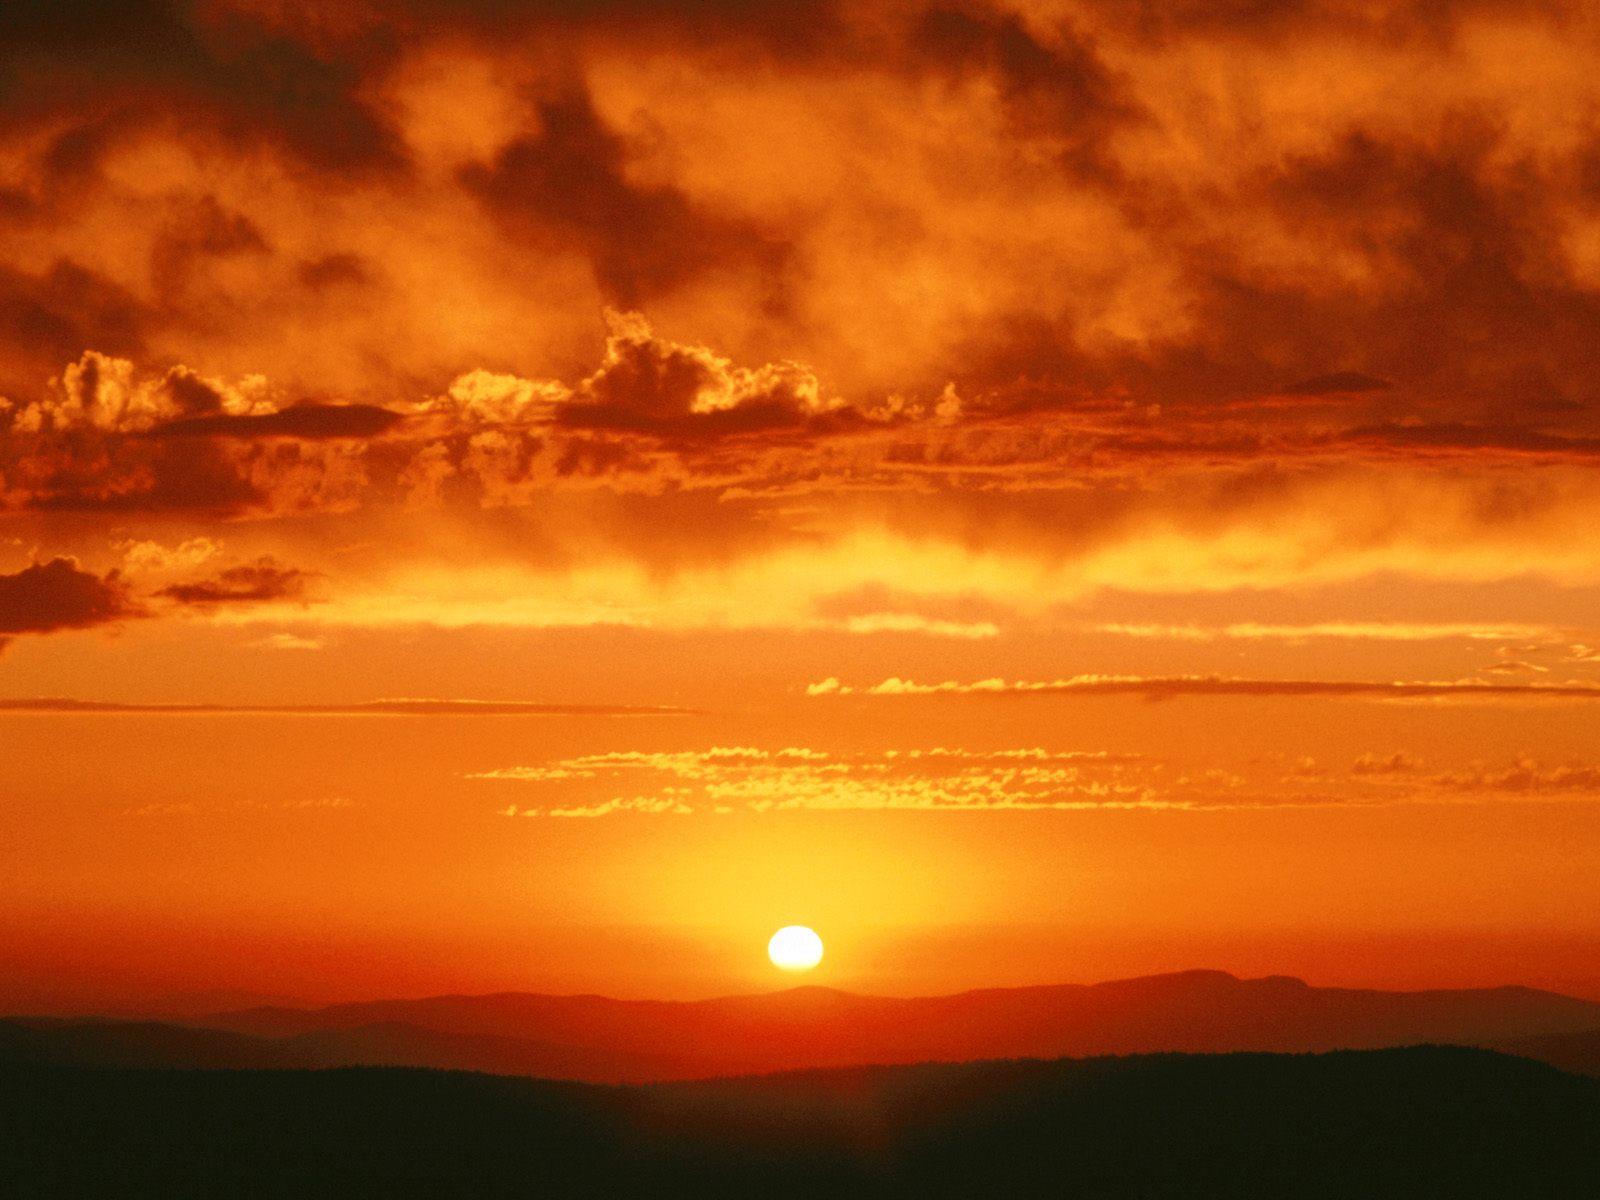 HD wallpaper Alaska Sunset Orange Sky Hd Wallpaper | Wallpaper ...